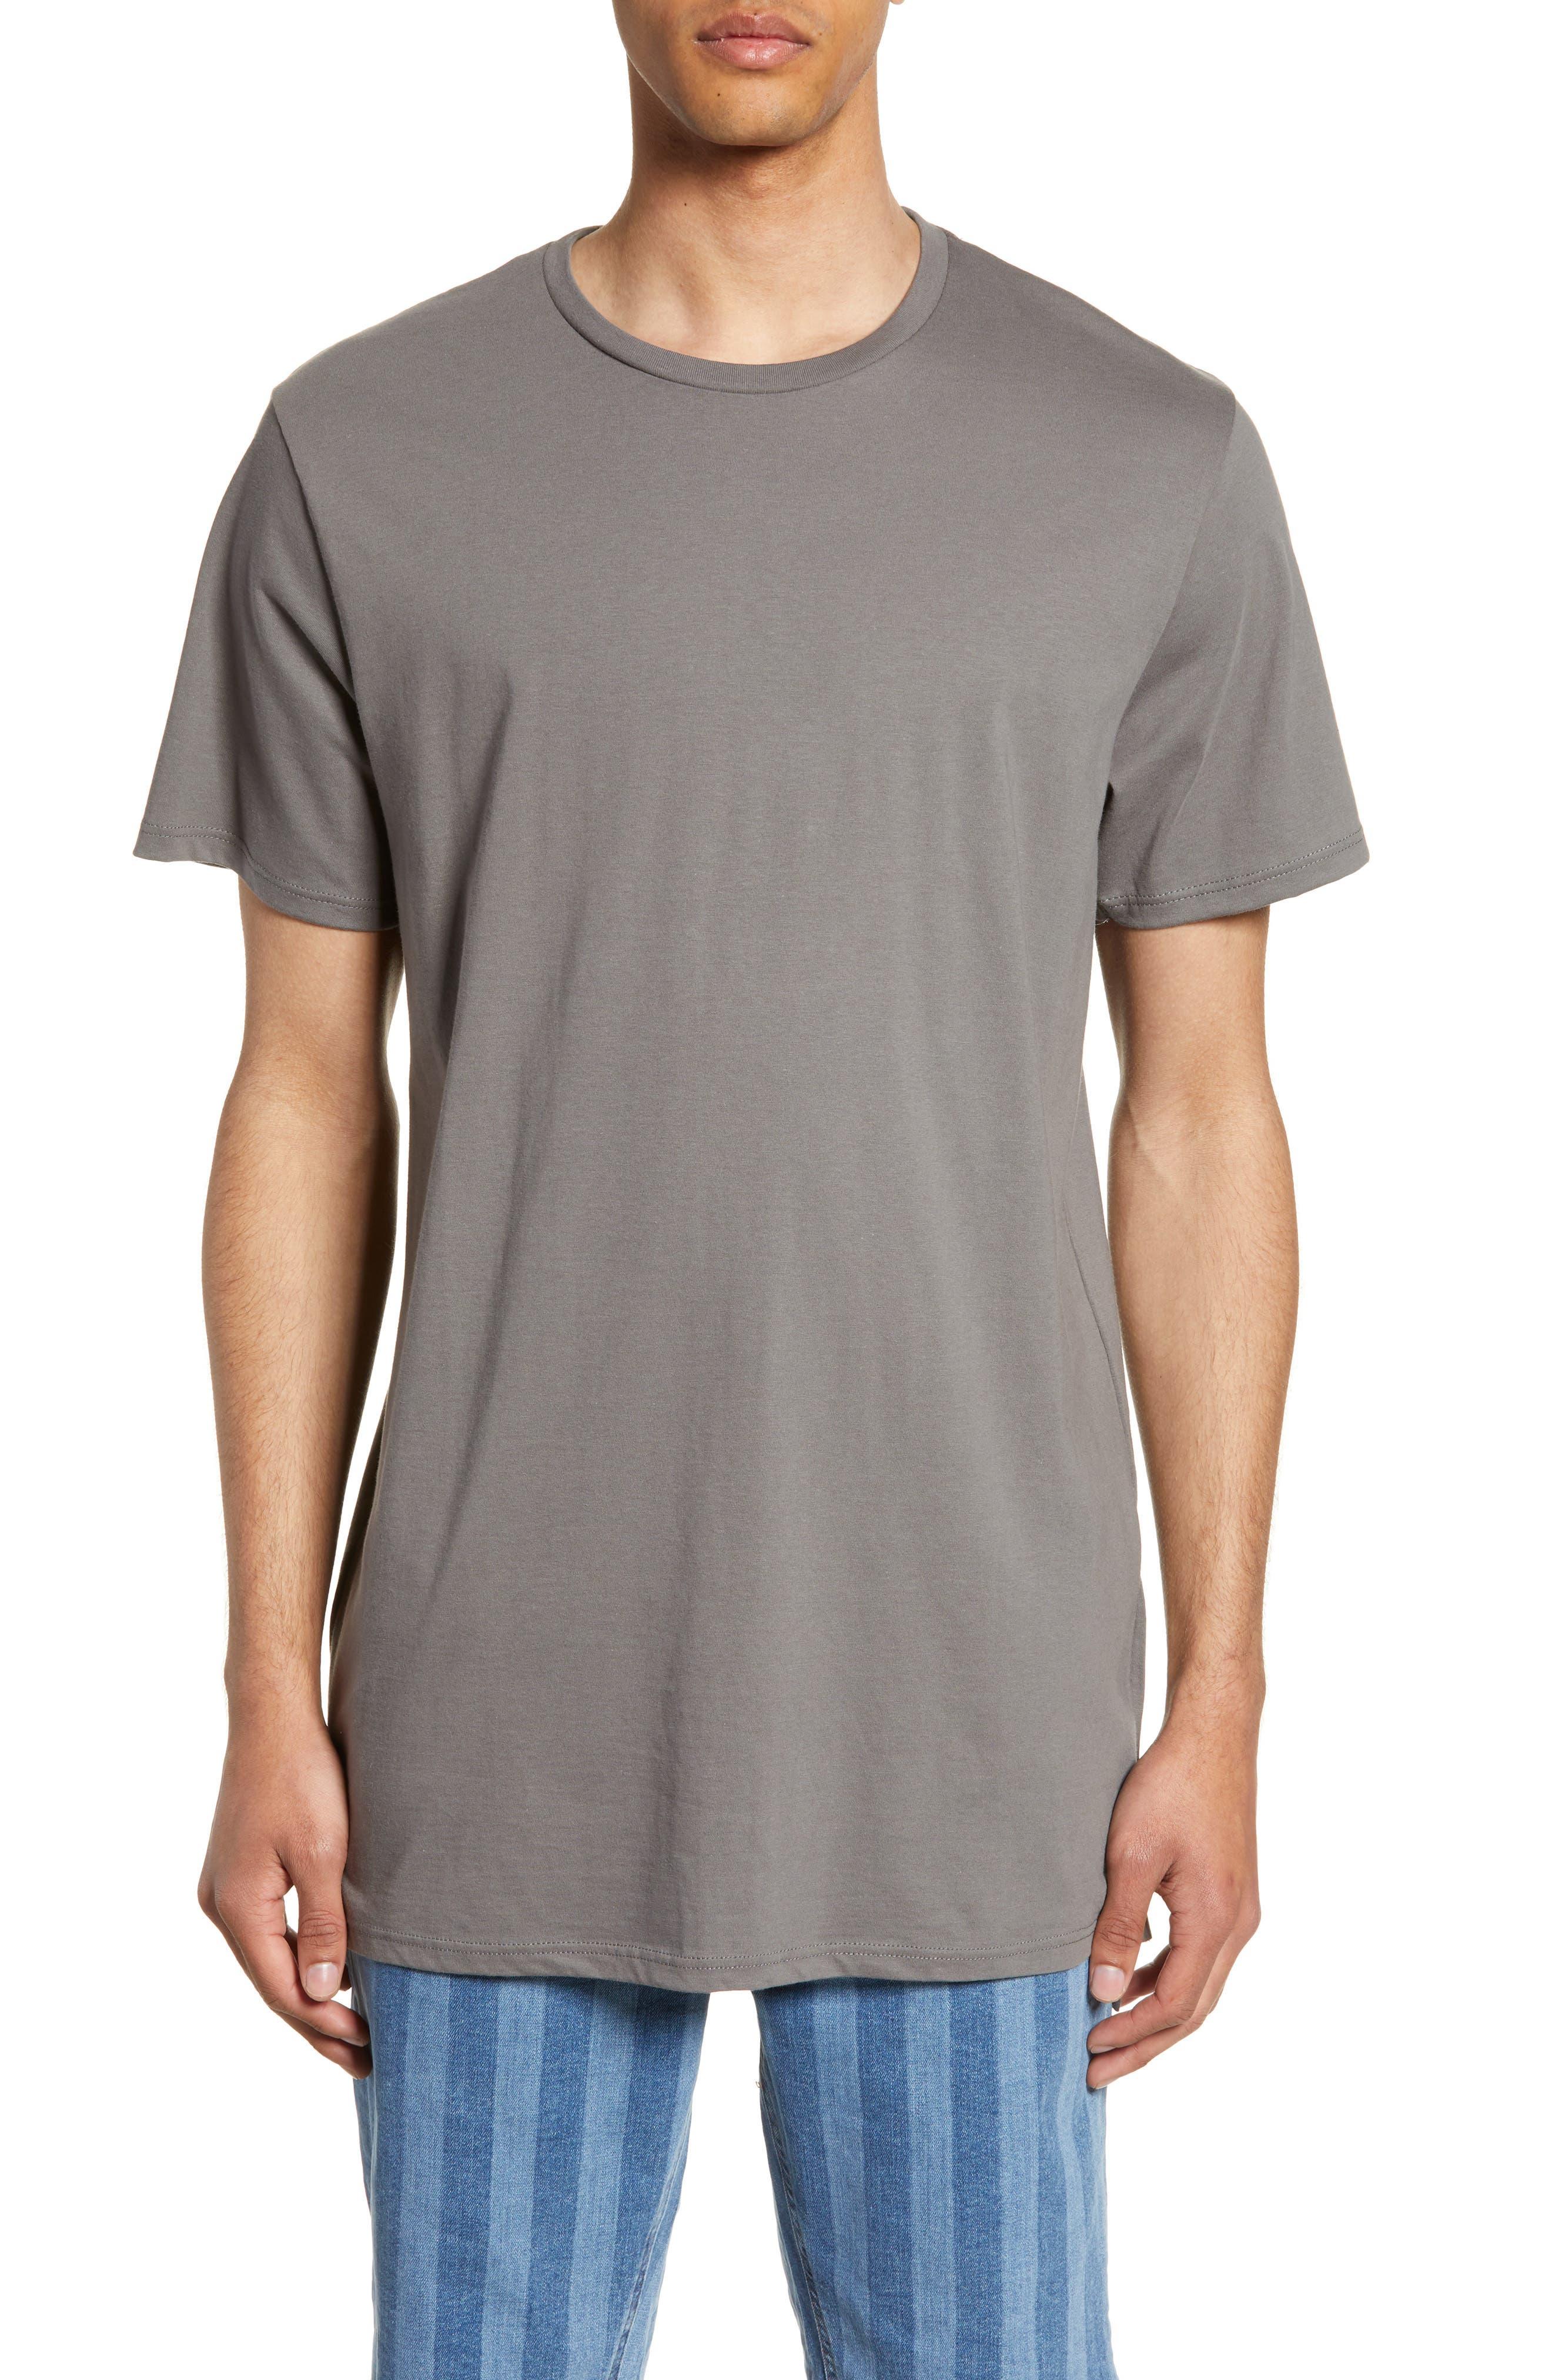 TOPMAN Longline T-Shirt, Main, color, GREY